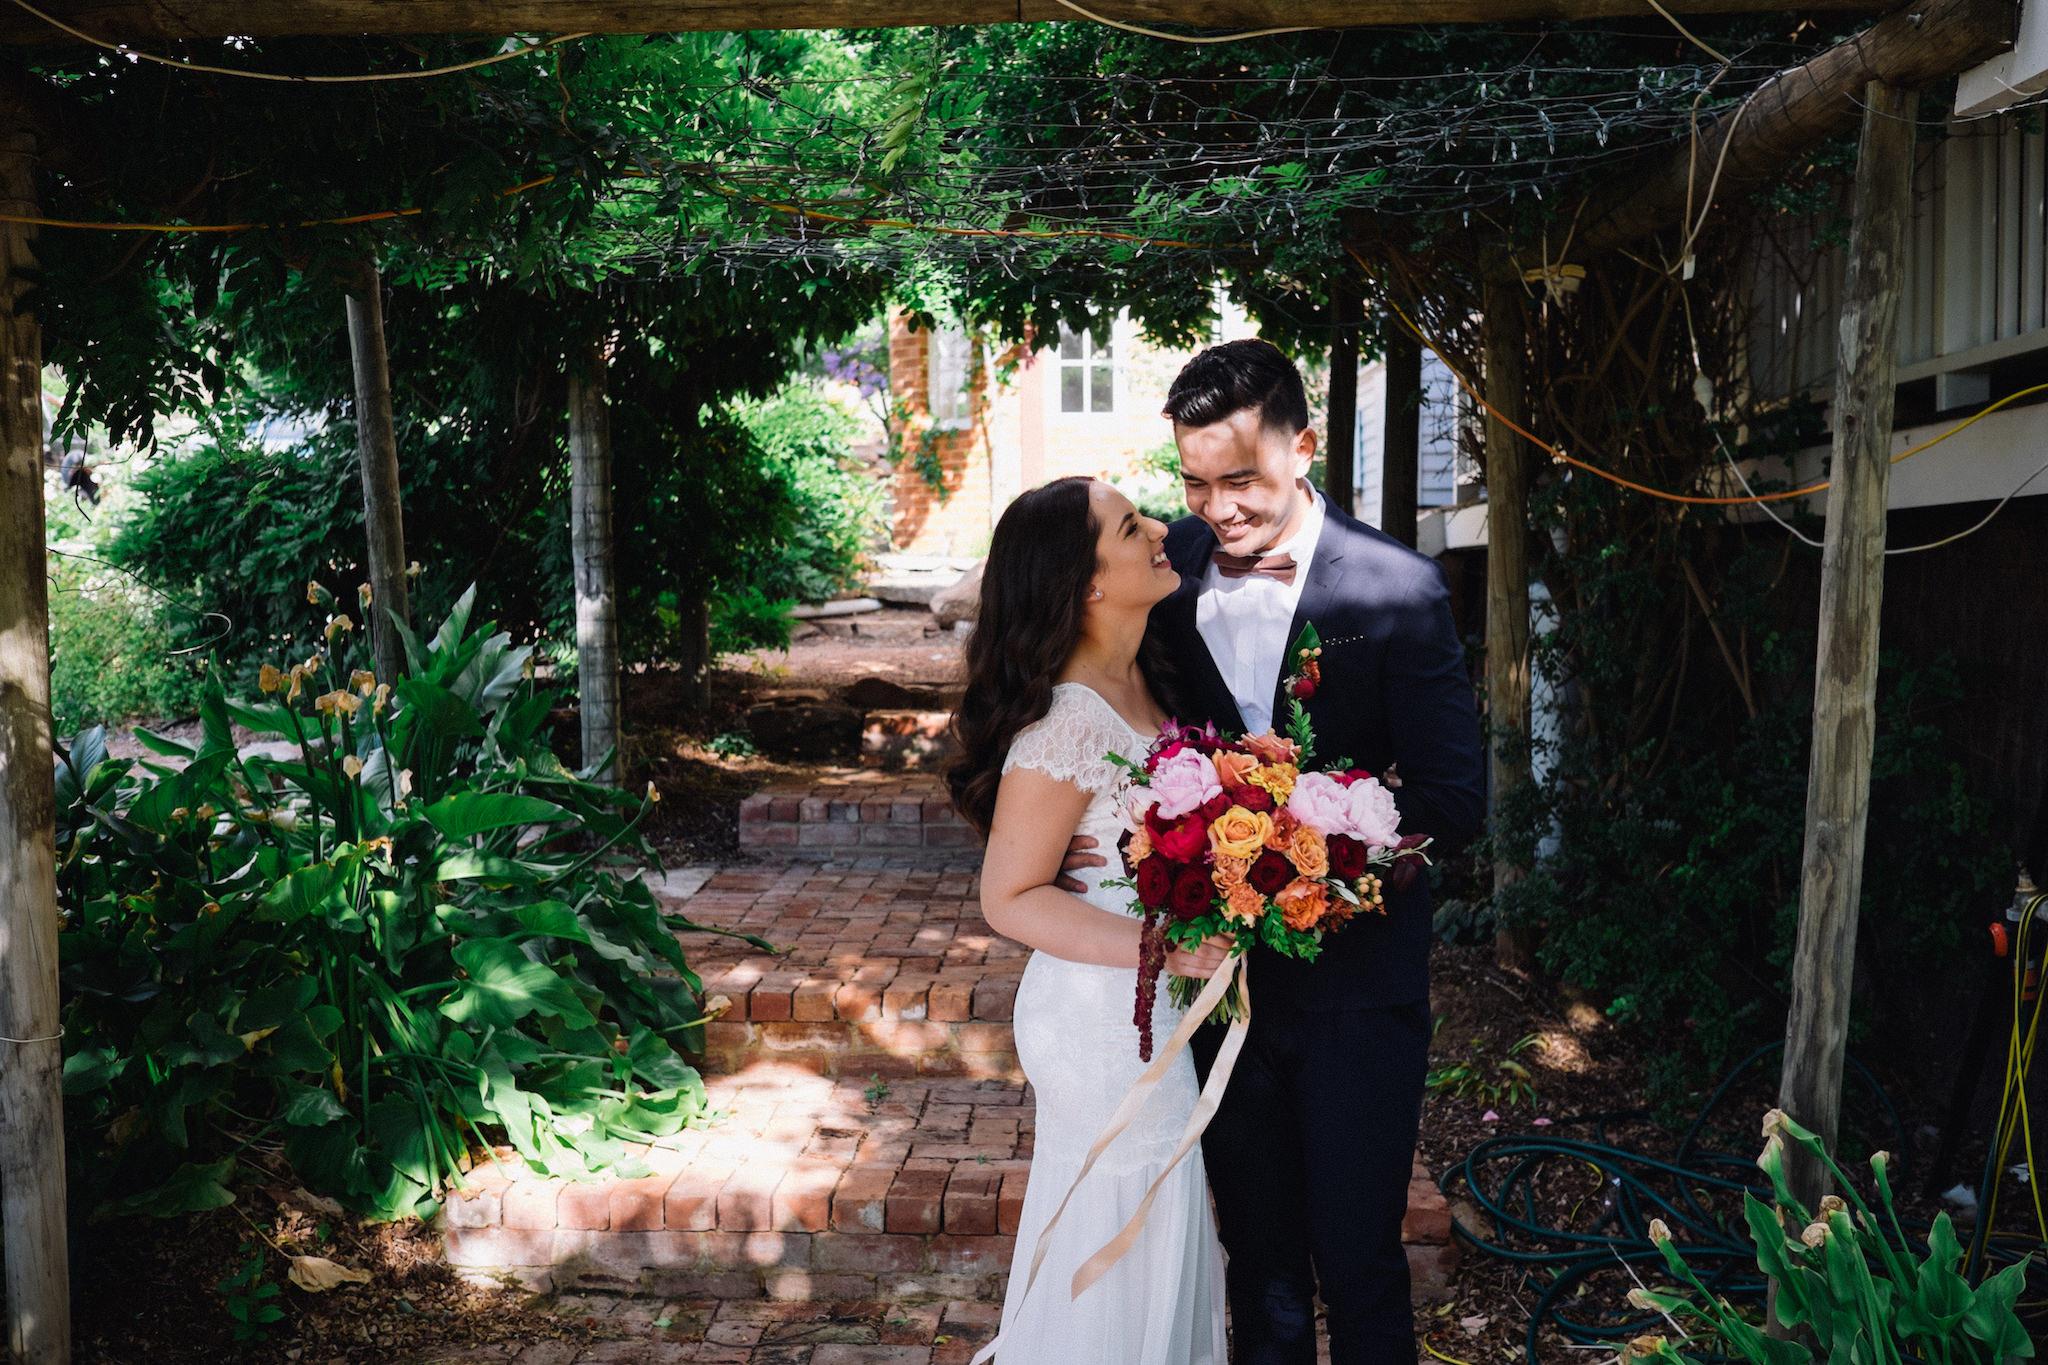 Laurelville Manor Sarah Marvin York Wedding Photographer 35